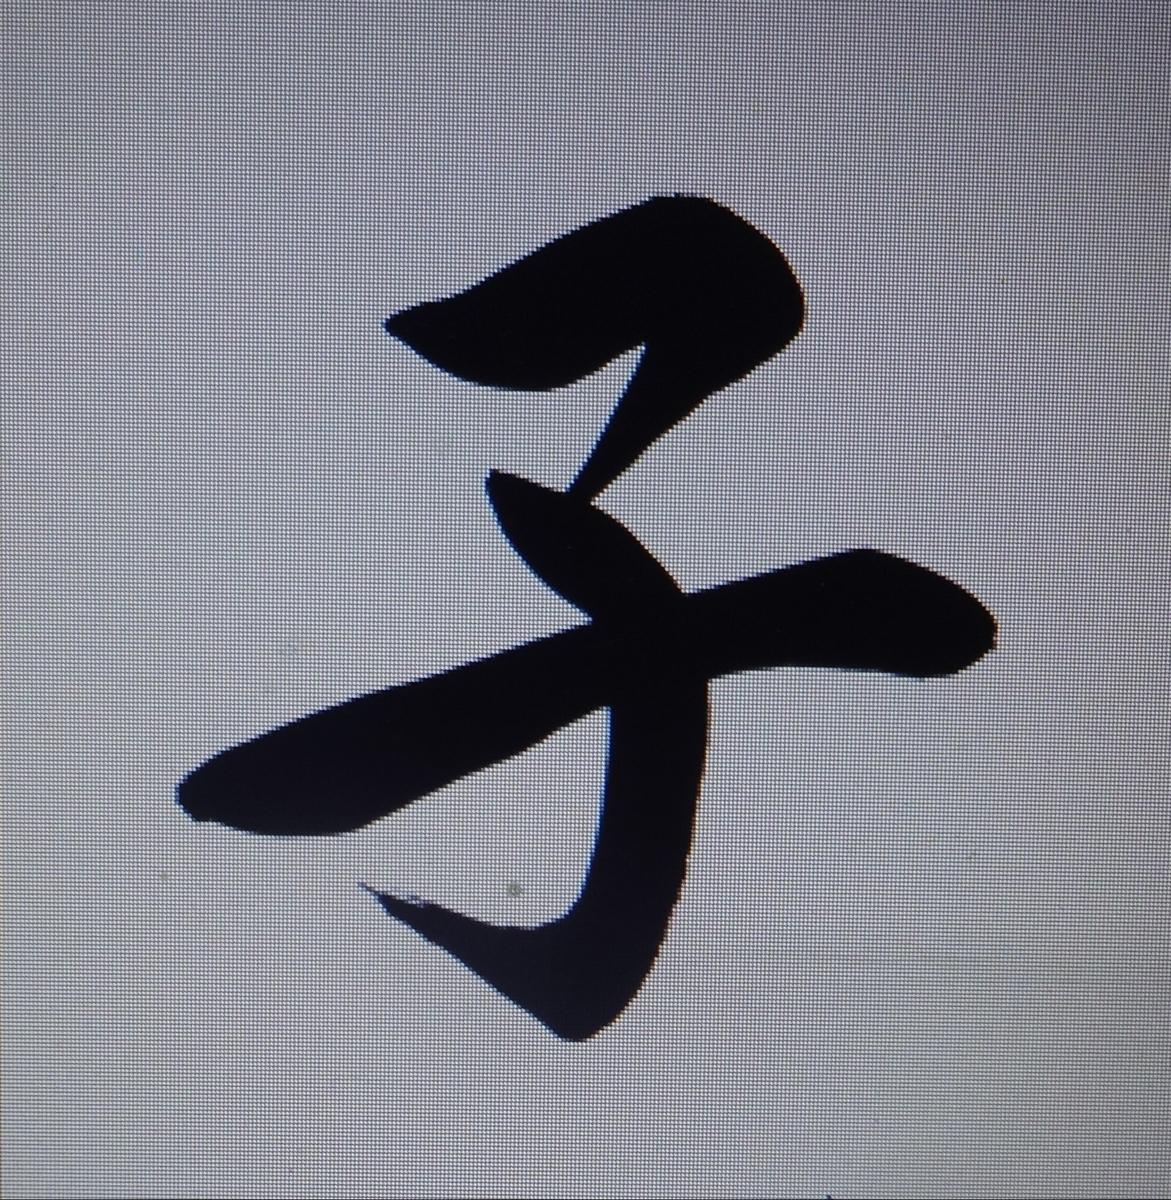 f:id:dajyaresensei:20200104132007j:plain